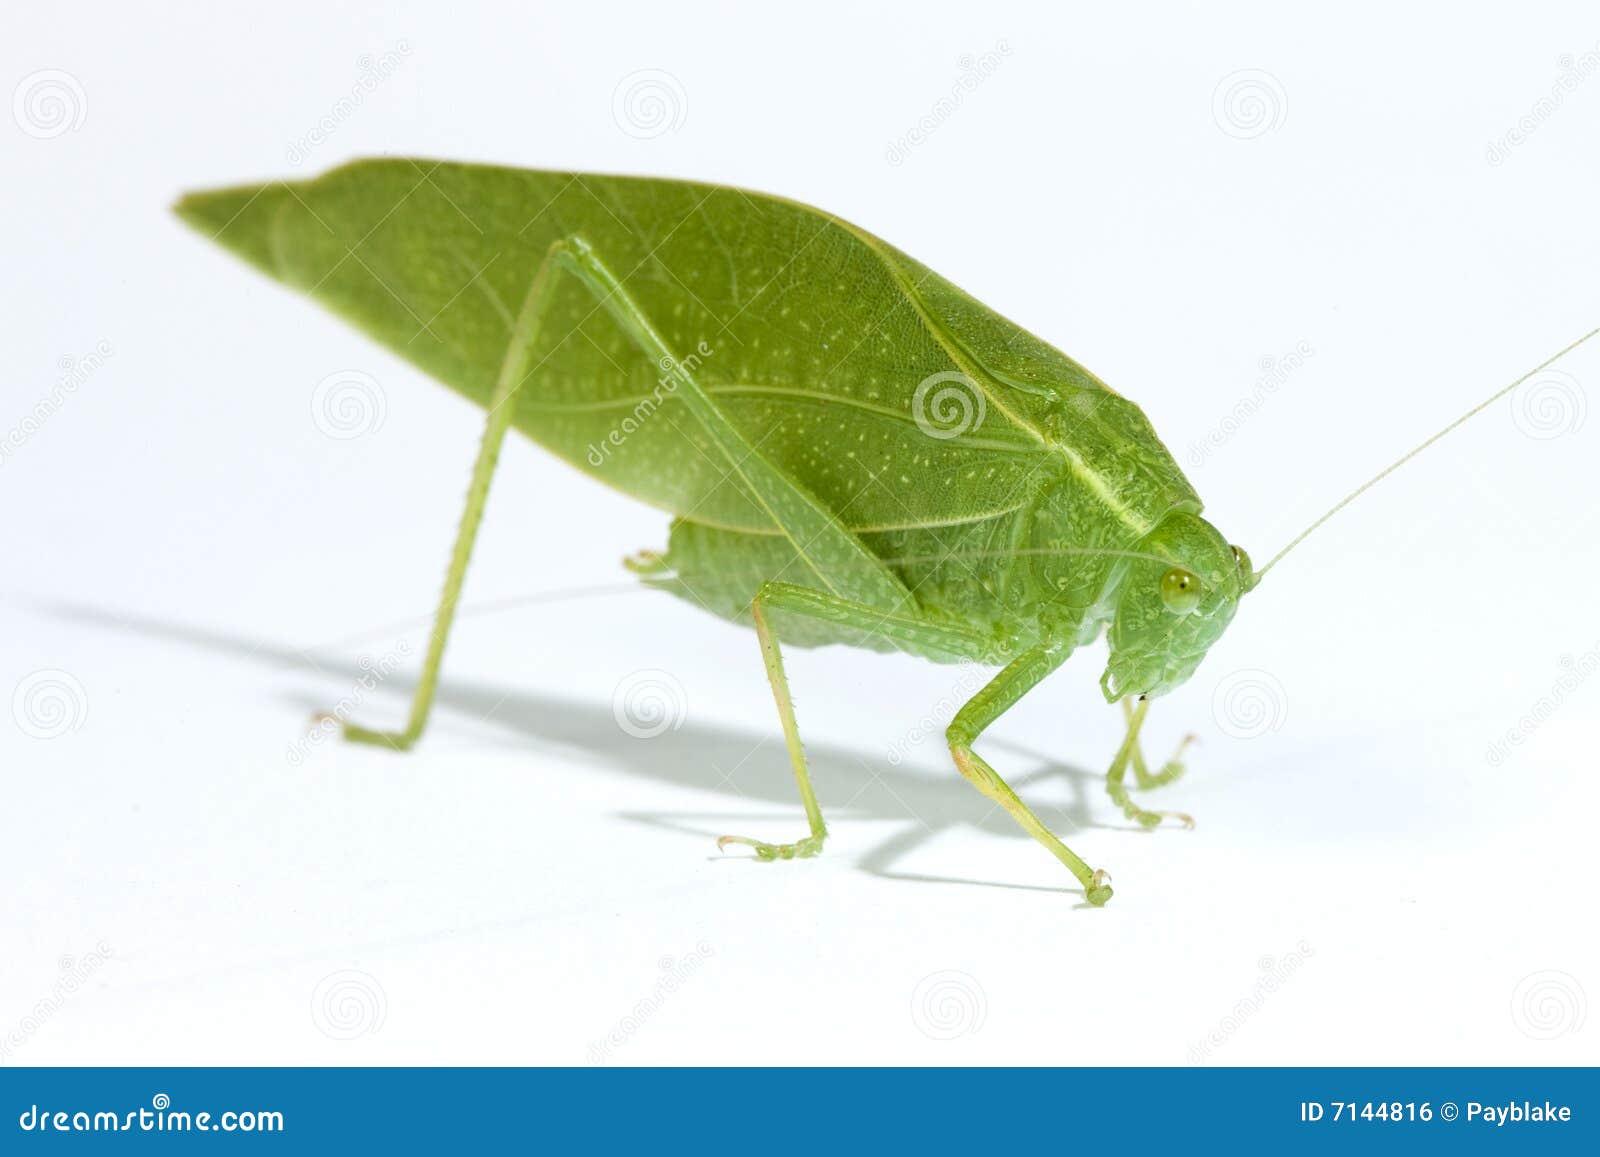 Green Leaf Bug Royalty Free Stock Image - Image: 7144816